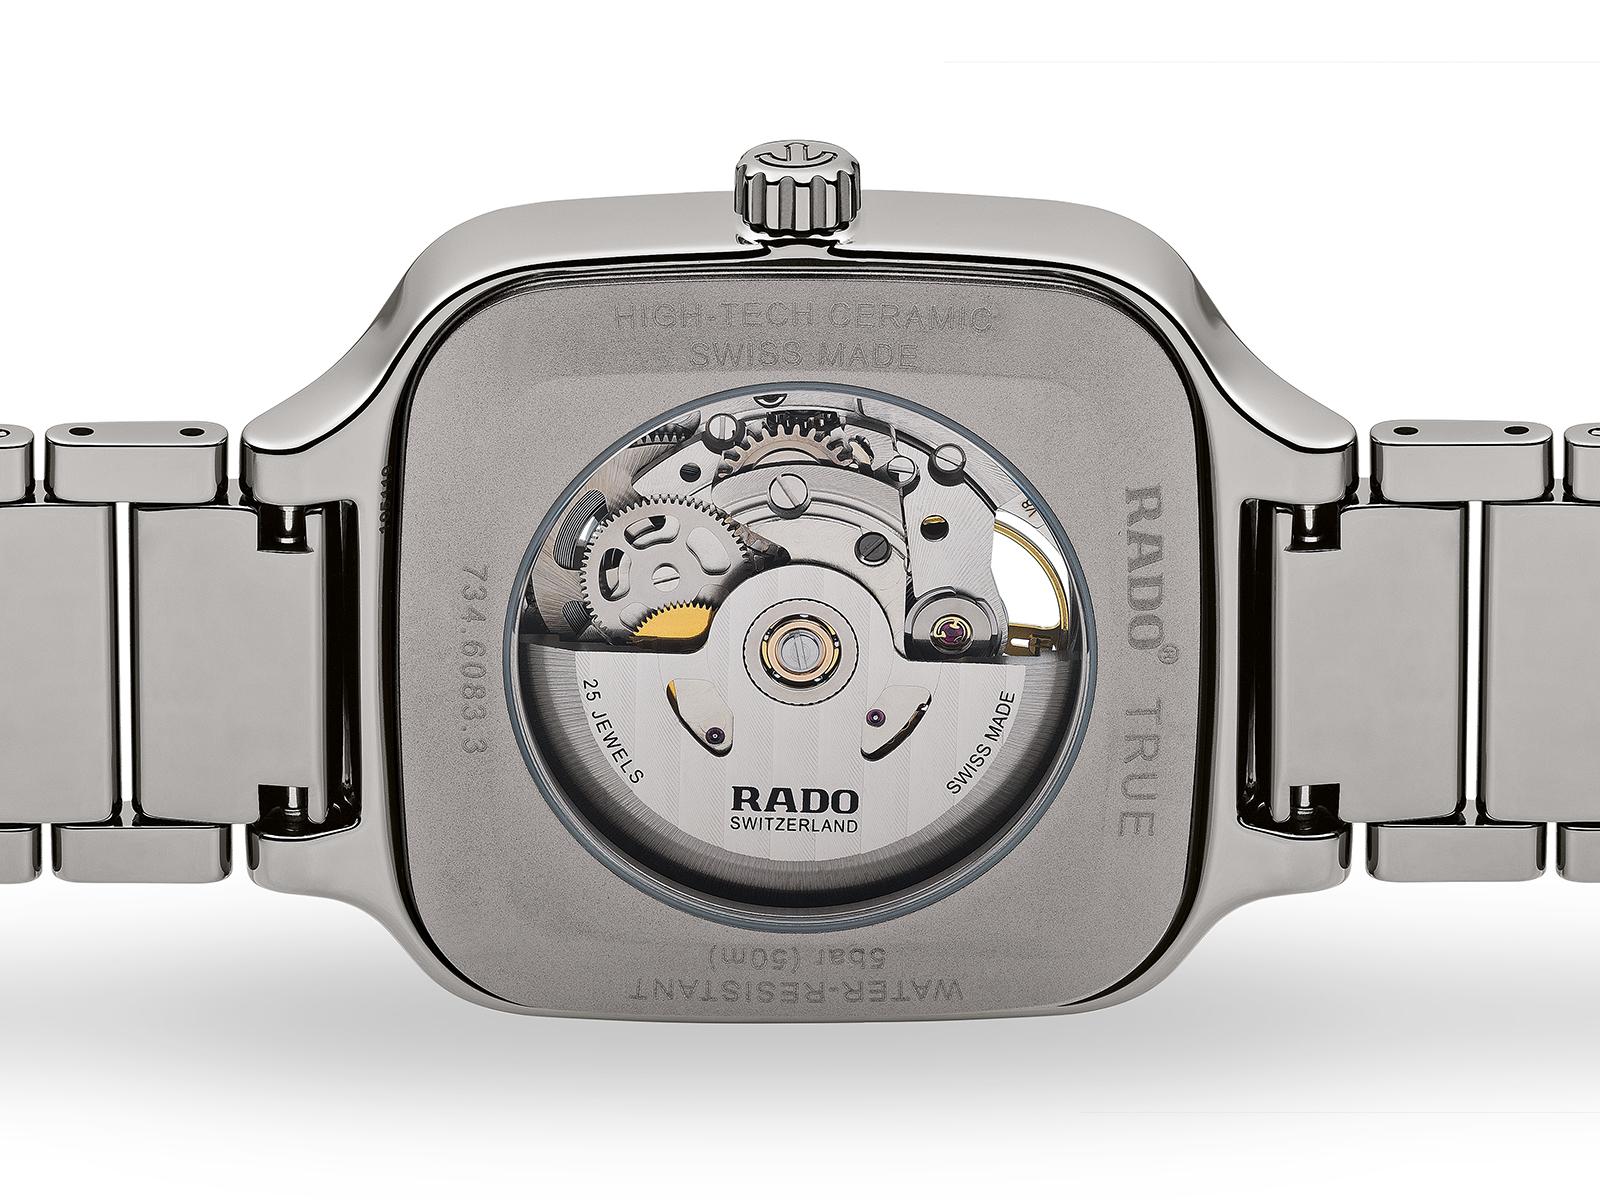 【RADO ラドー】True Square Automatic Open Heart トゥルースクエア オープンハート(ブルー)/正規輸入品